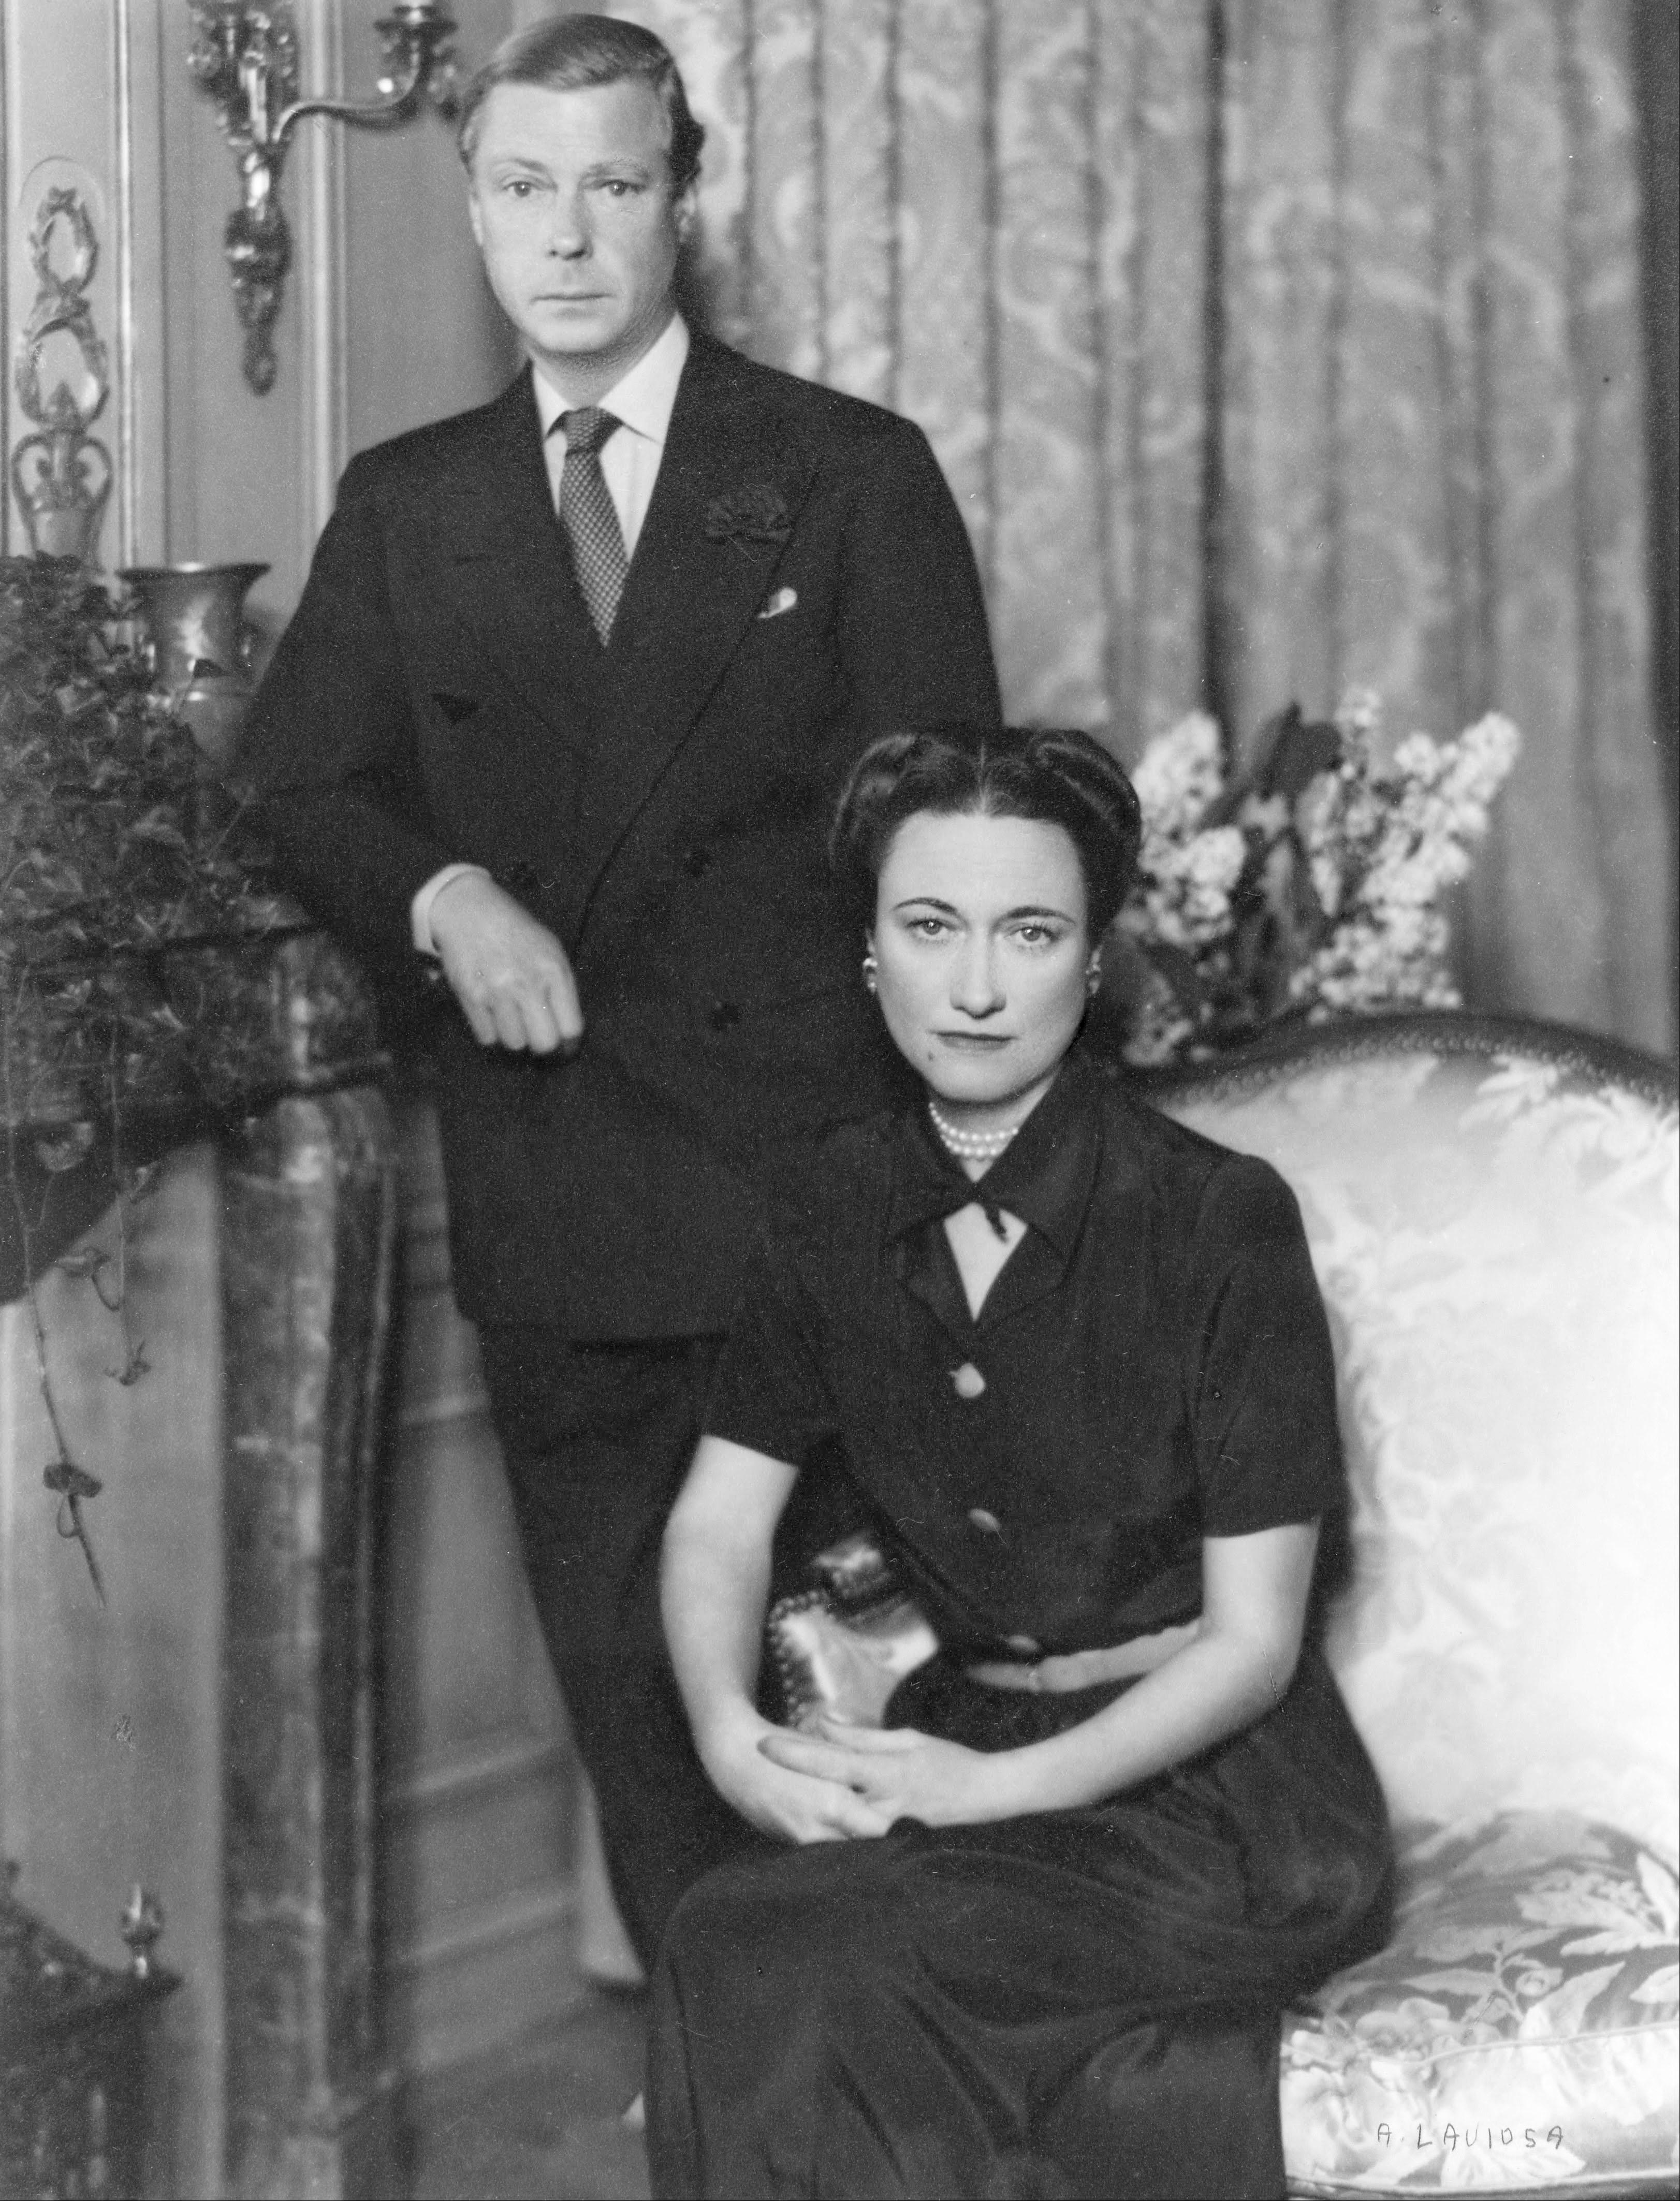 A. Laviosa, The Duke and Duchess of Windsor, circa 1934, portret, Wallis Simpson